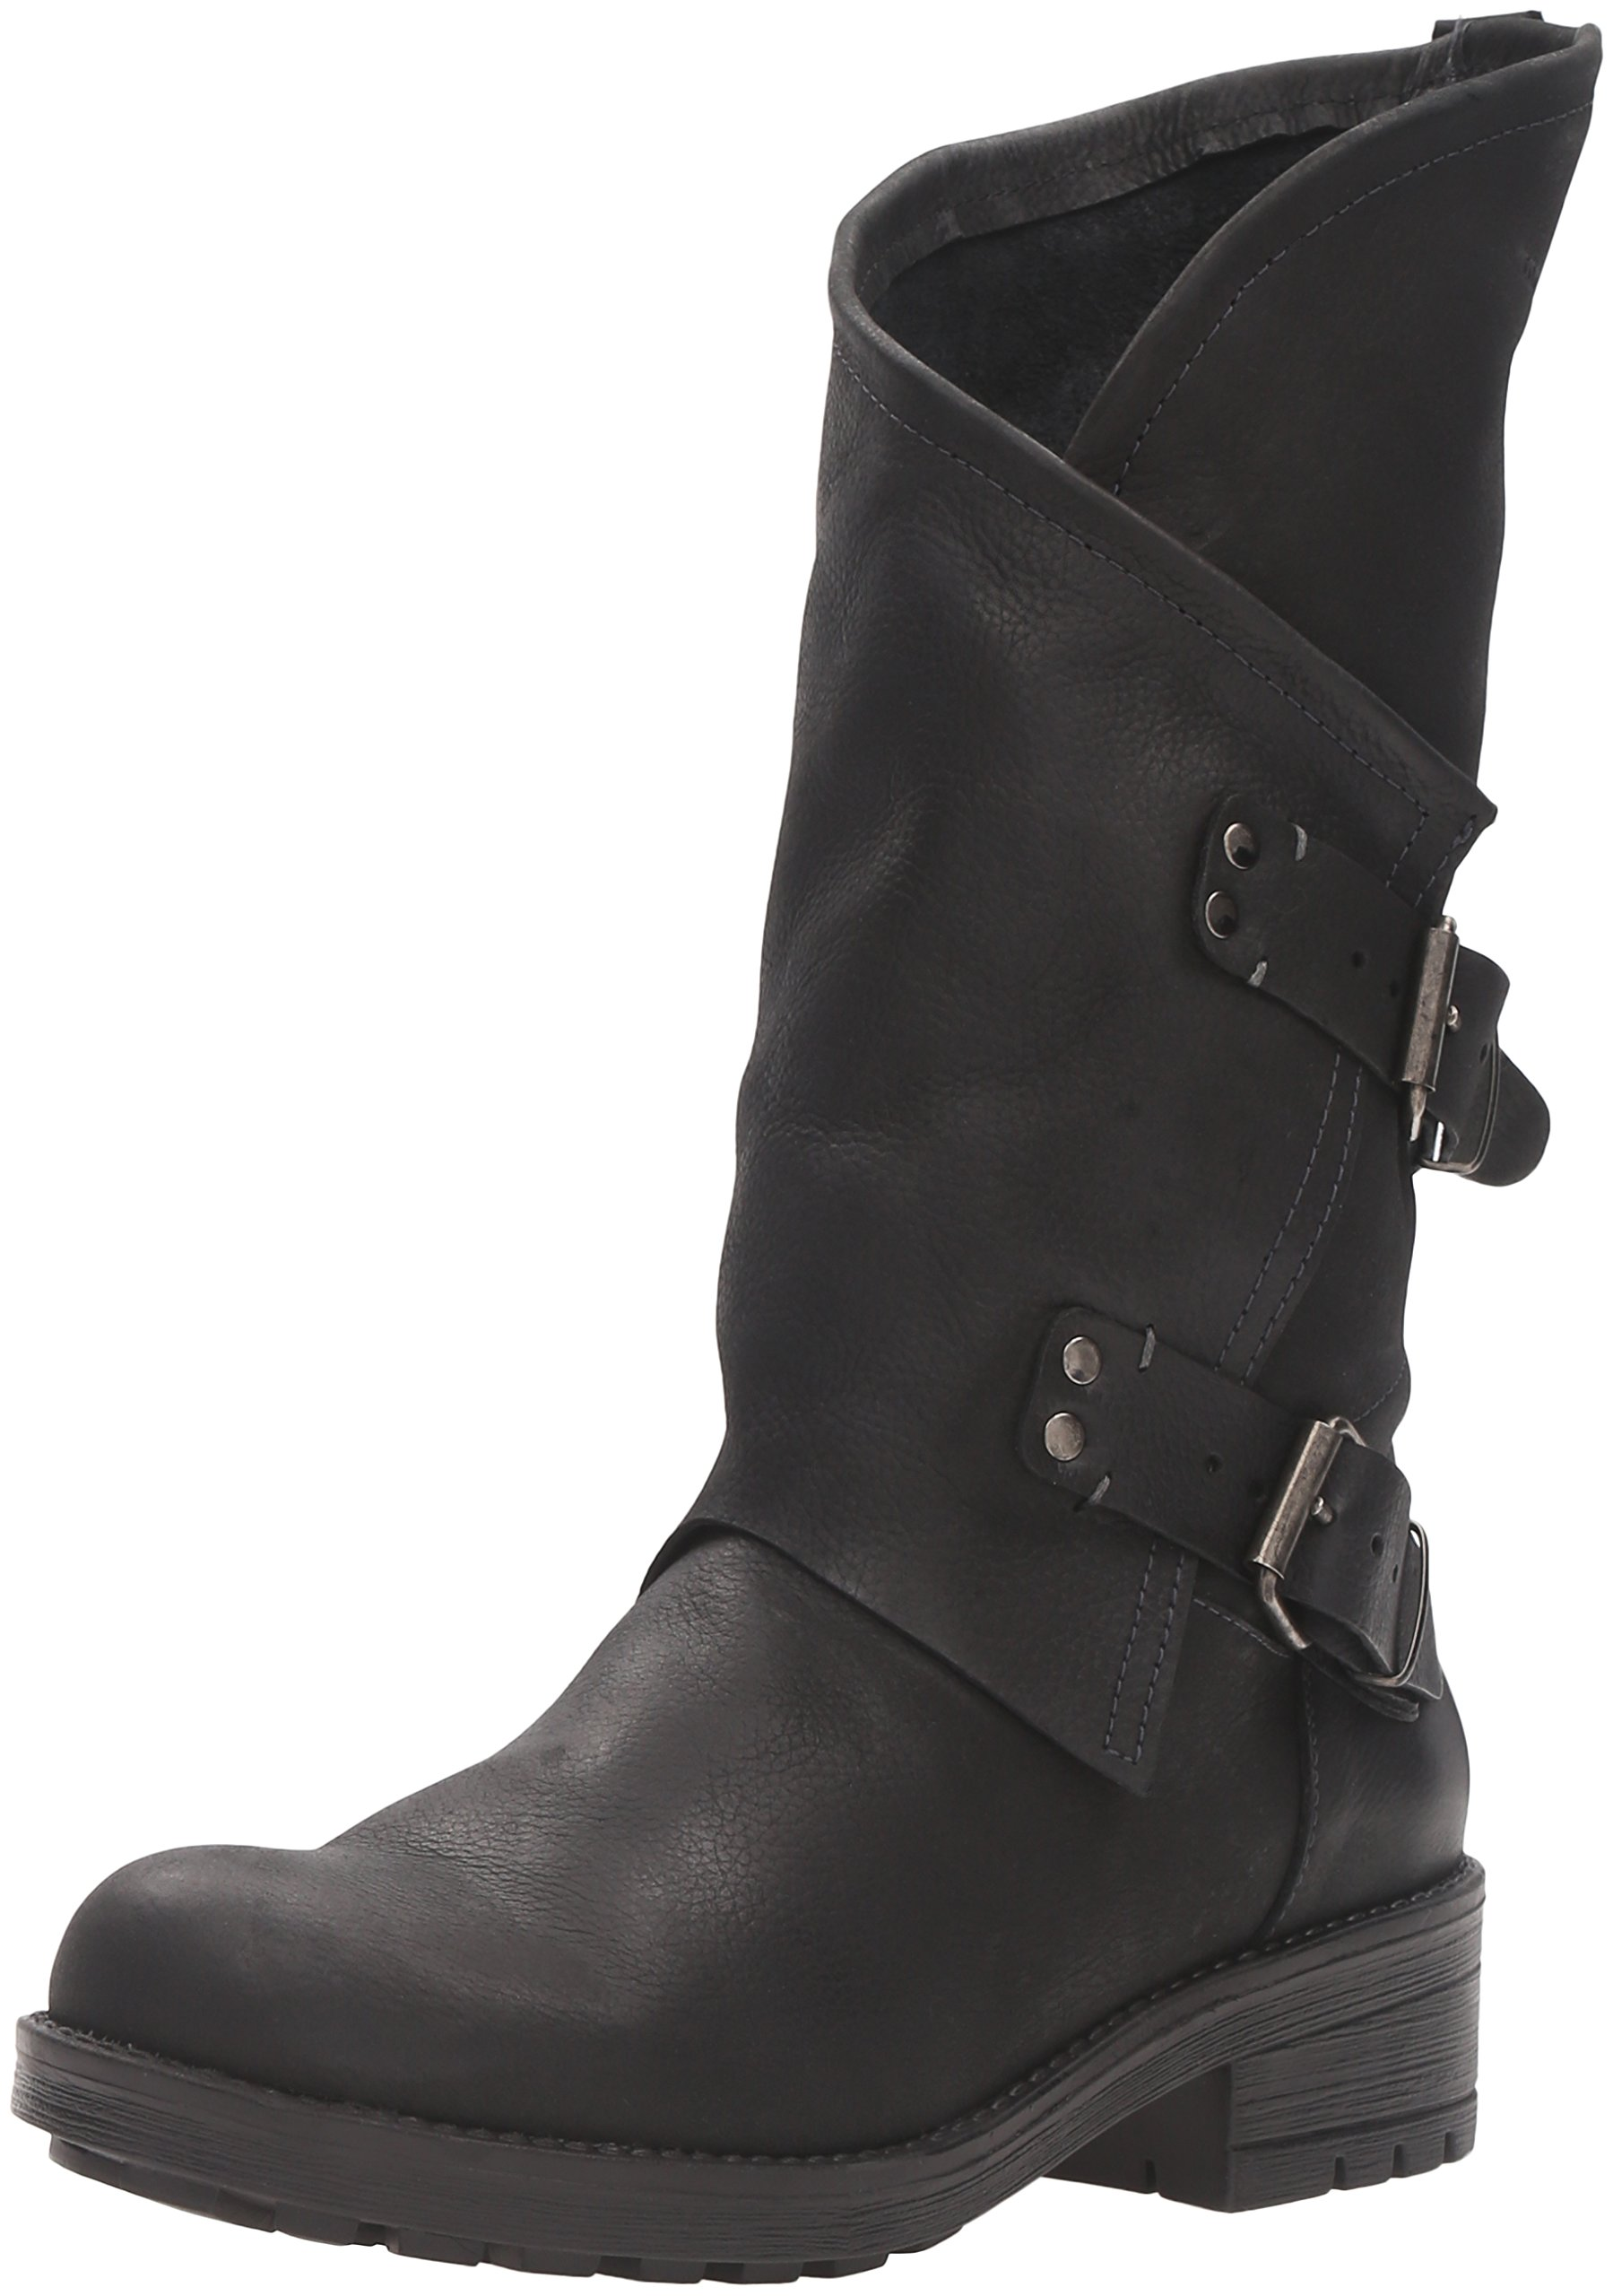 Coolway Women's Alida Motorcycle Boot, Black, 39 EU/8-8.5 M US